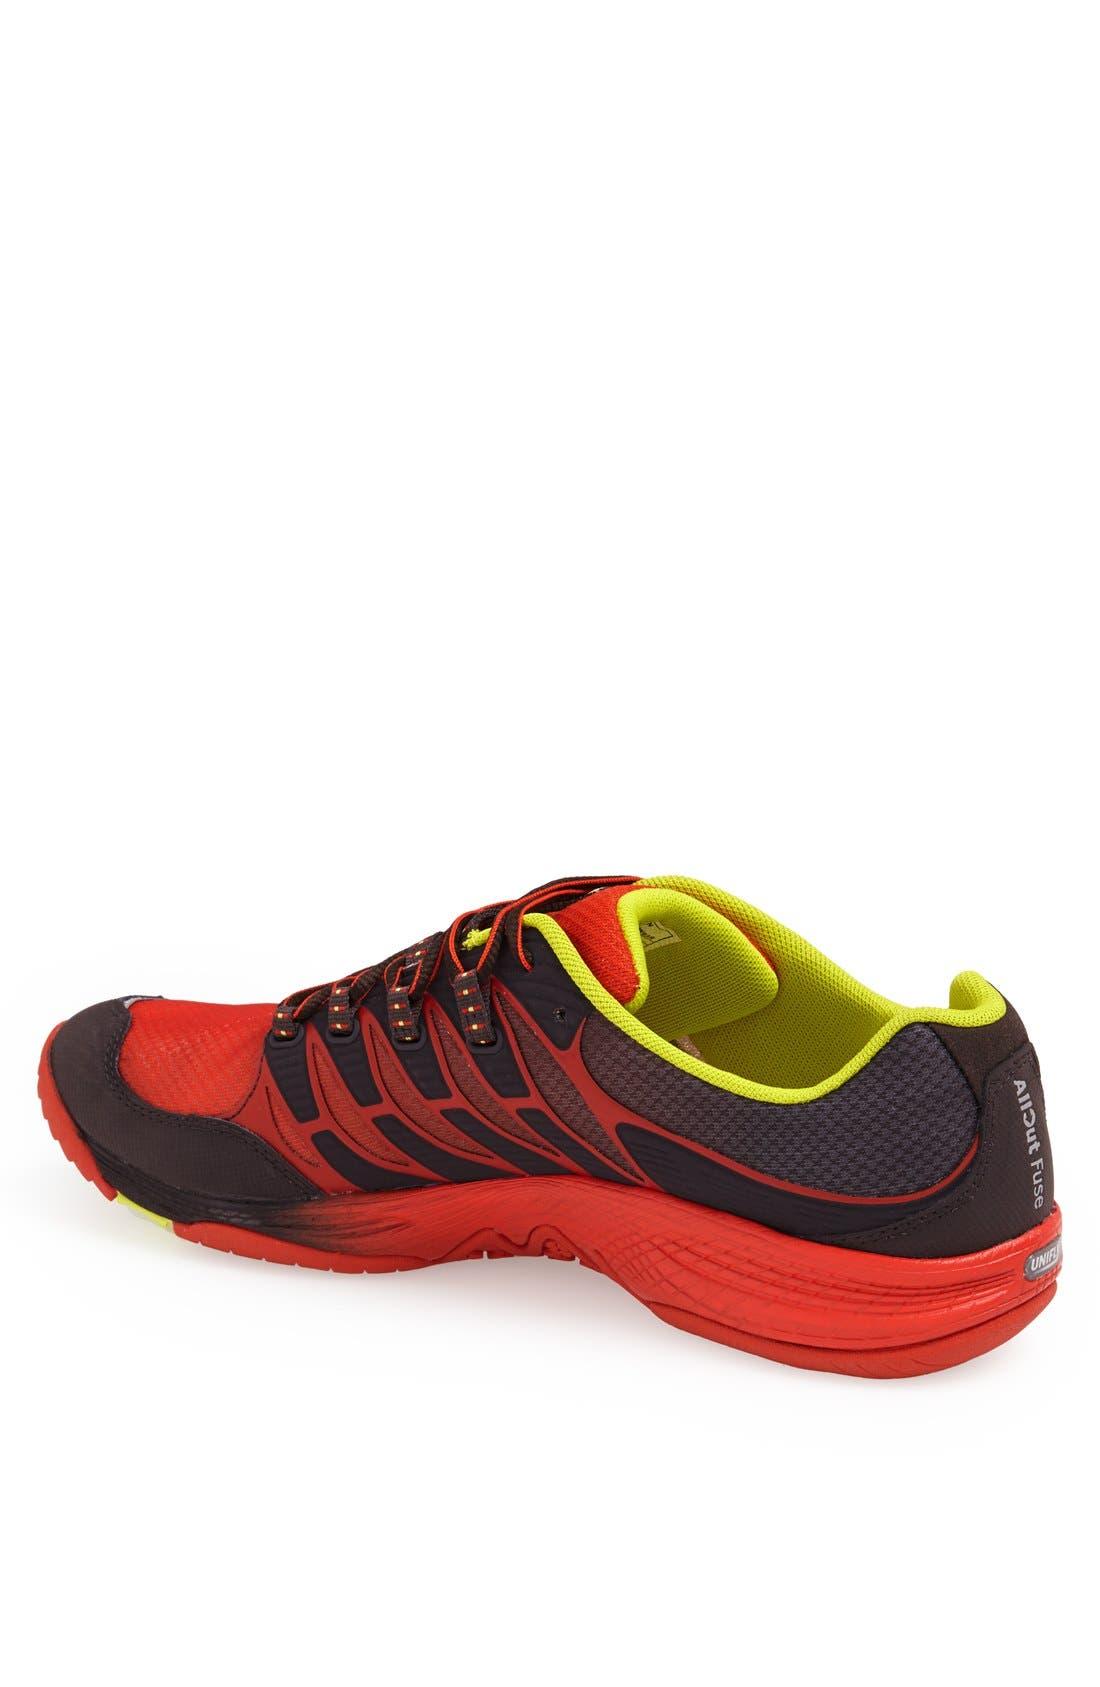 Alternate Image 2  - Merrell 'Allout Fuse' Trail Running Shoe (Men)